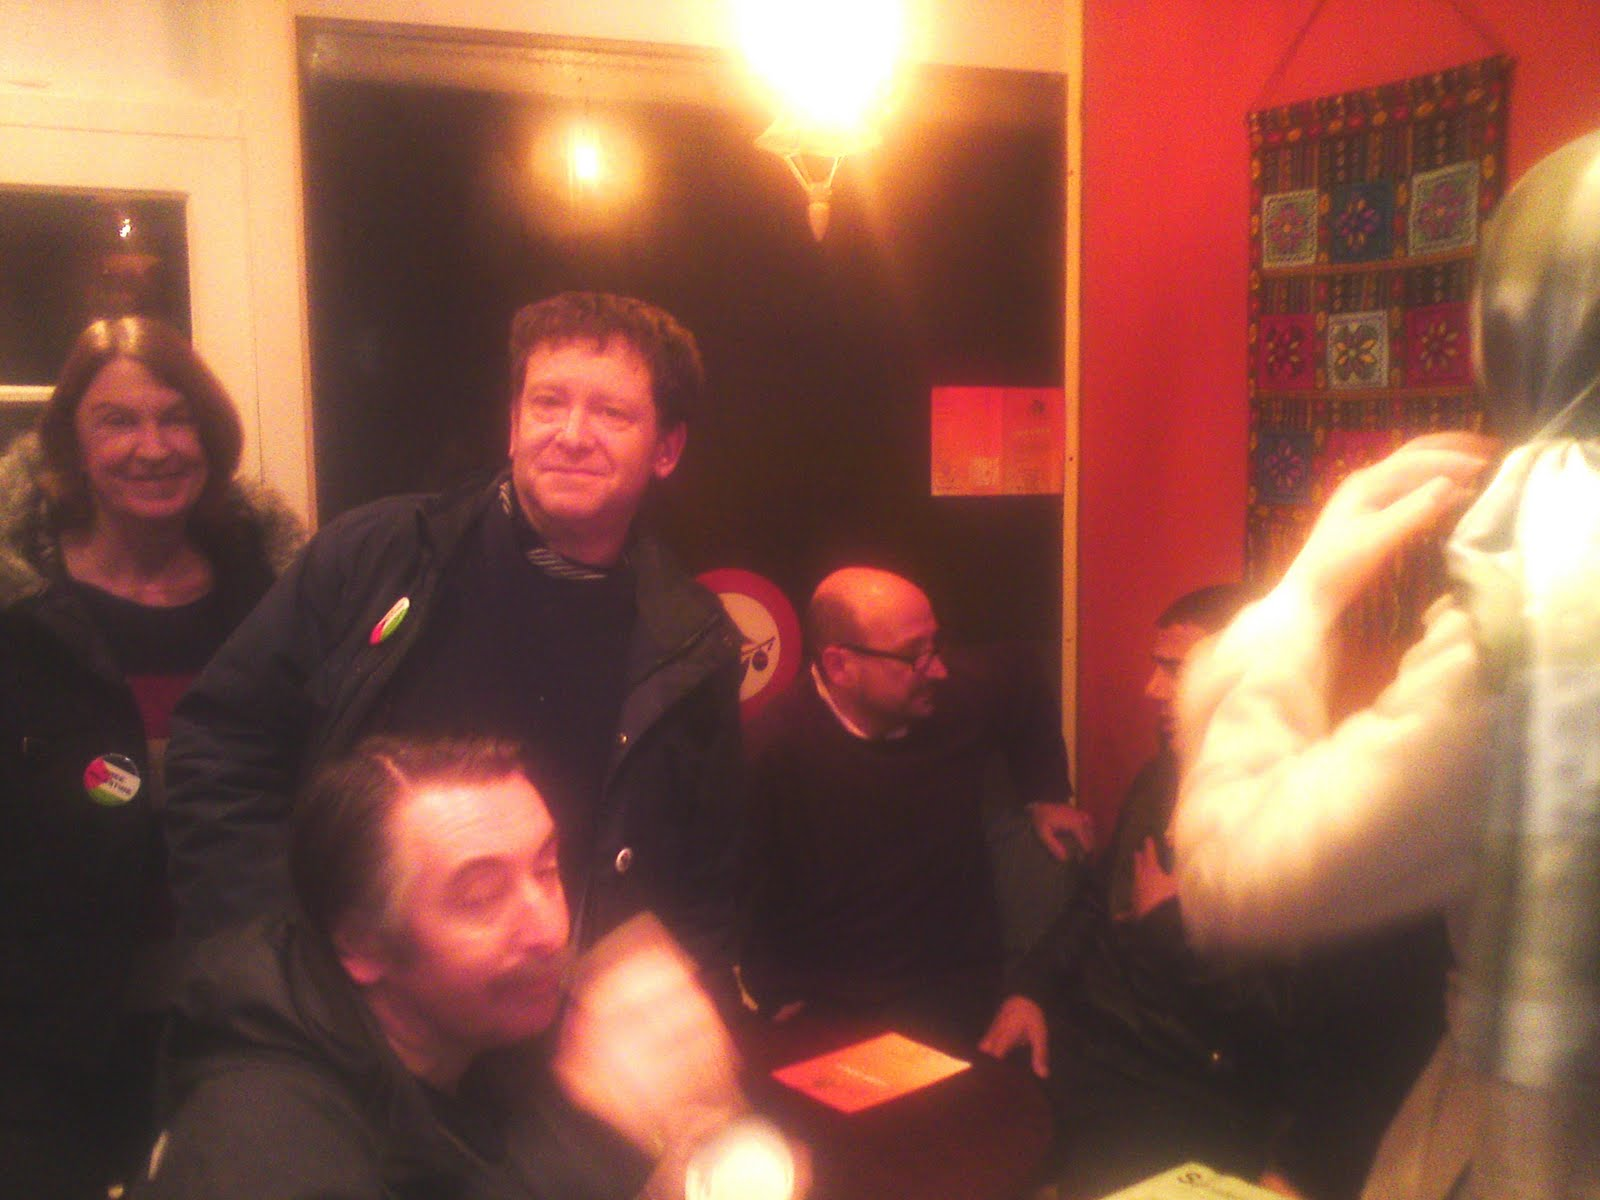 Tony Greenstein Blog: Tony Greenstein's Blog: Brighton PSC Hosts Speaker From